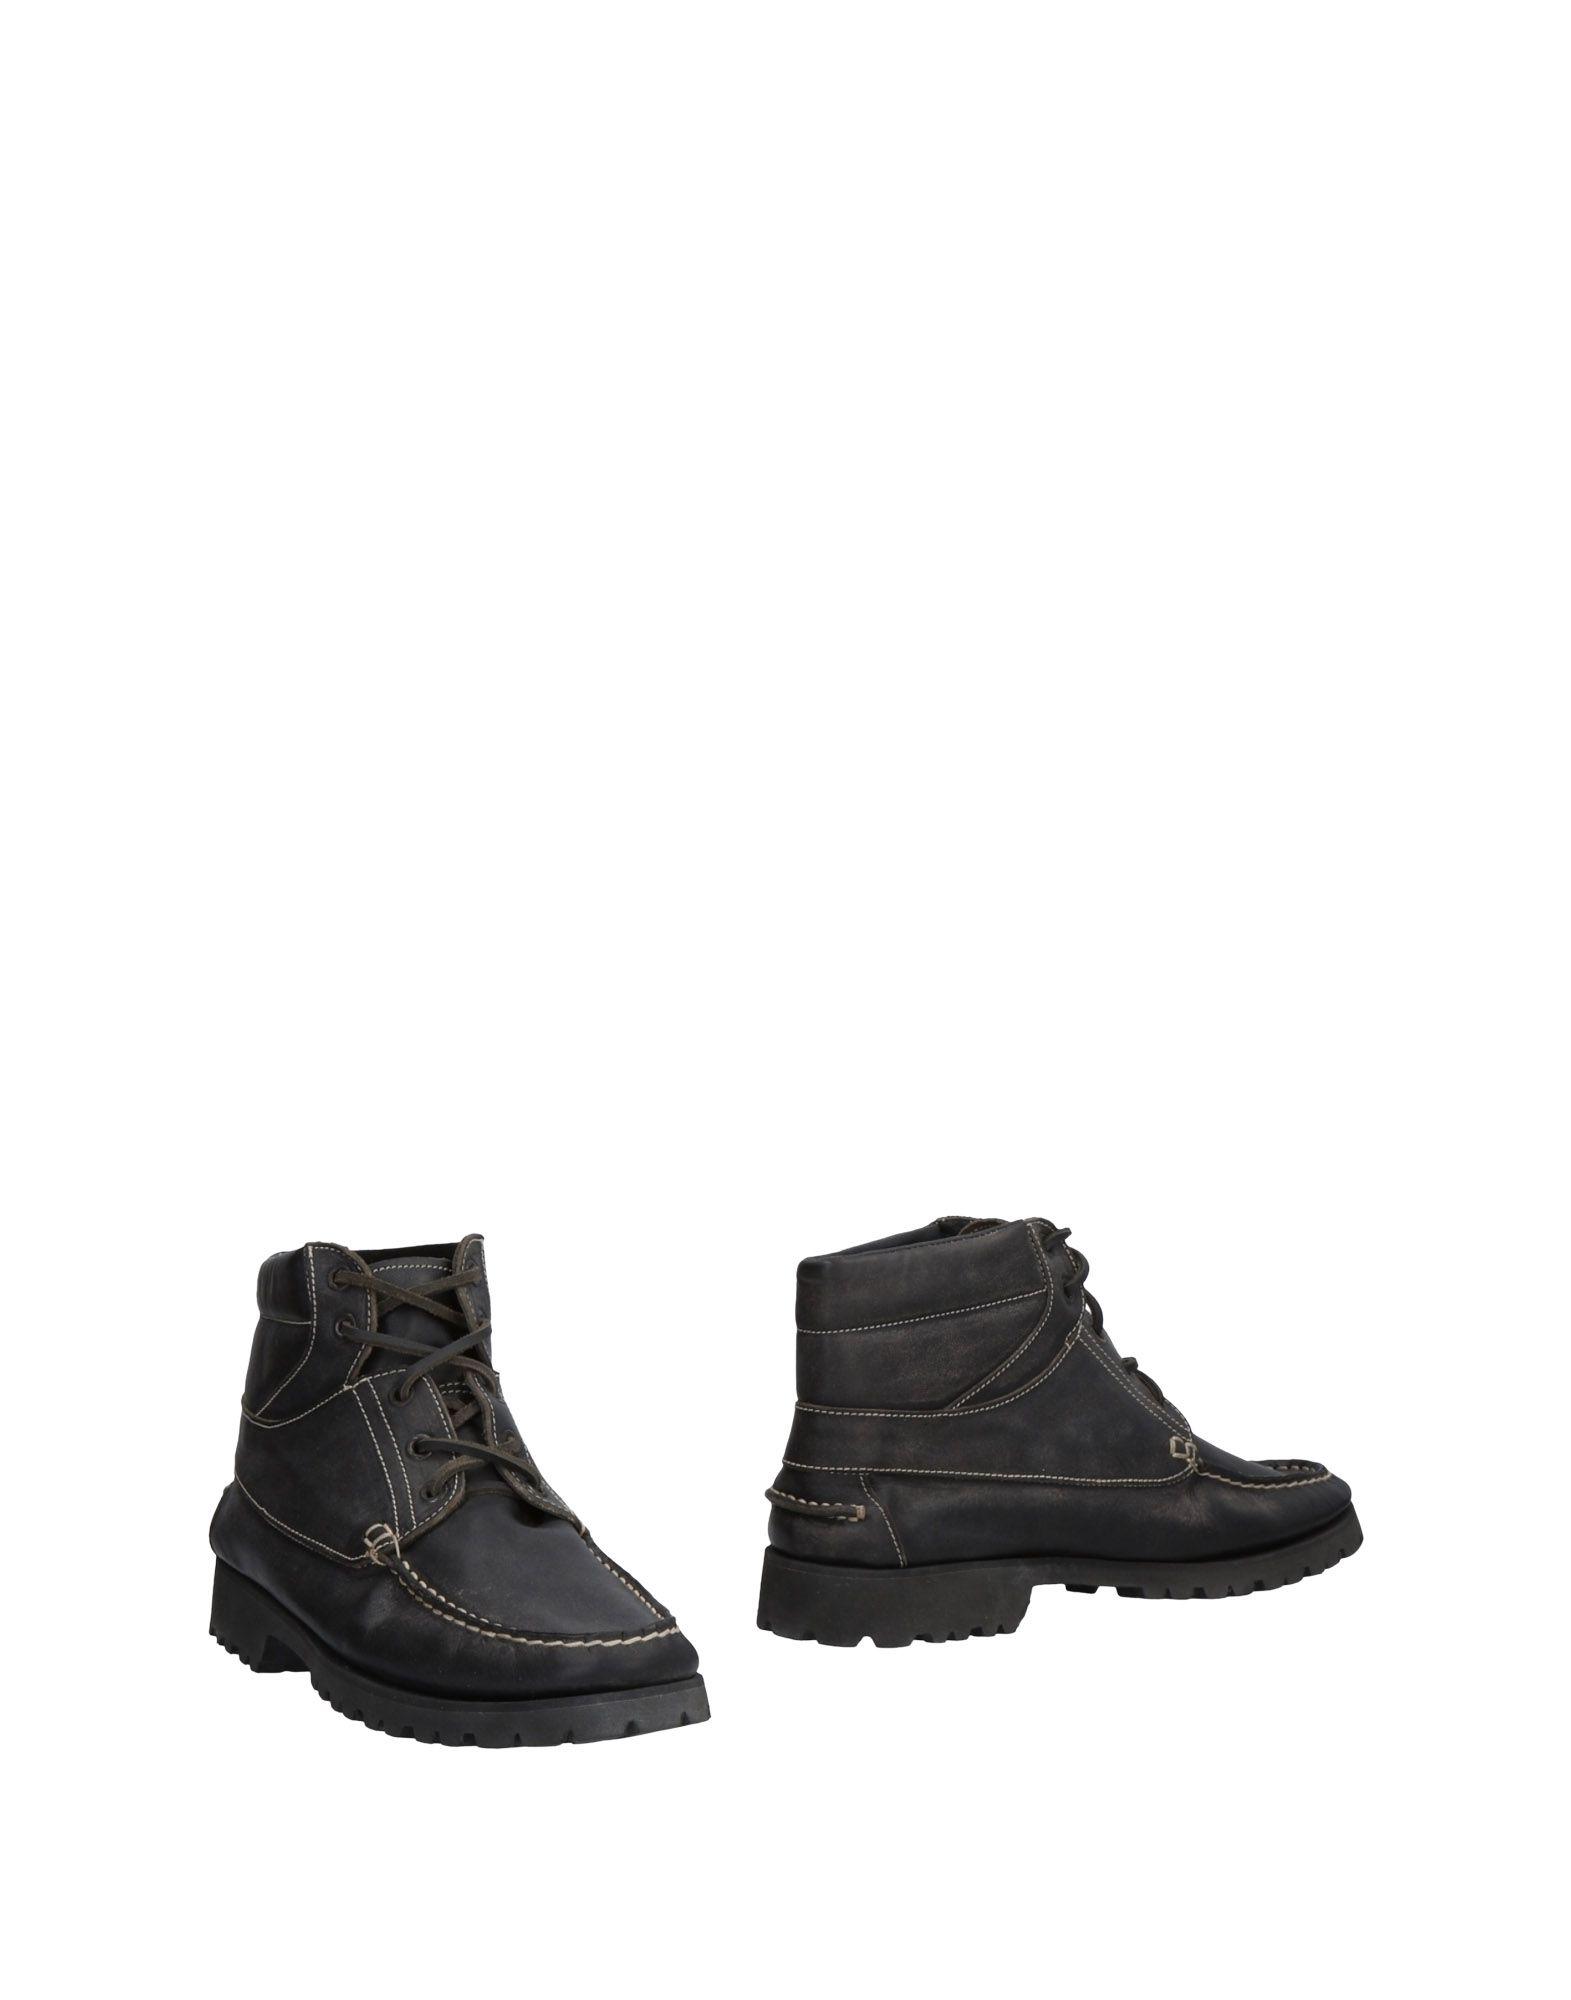 Gut um billige Schuhe tragenGiorgio zu tragenGiorgio Schuhe Brato Stiefelette Damen 11458422QI ad5c6c